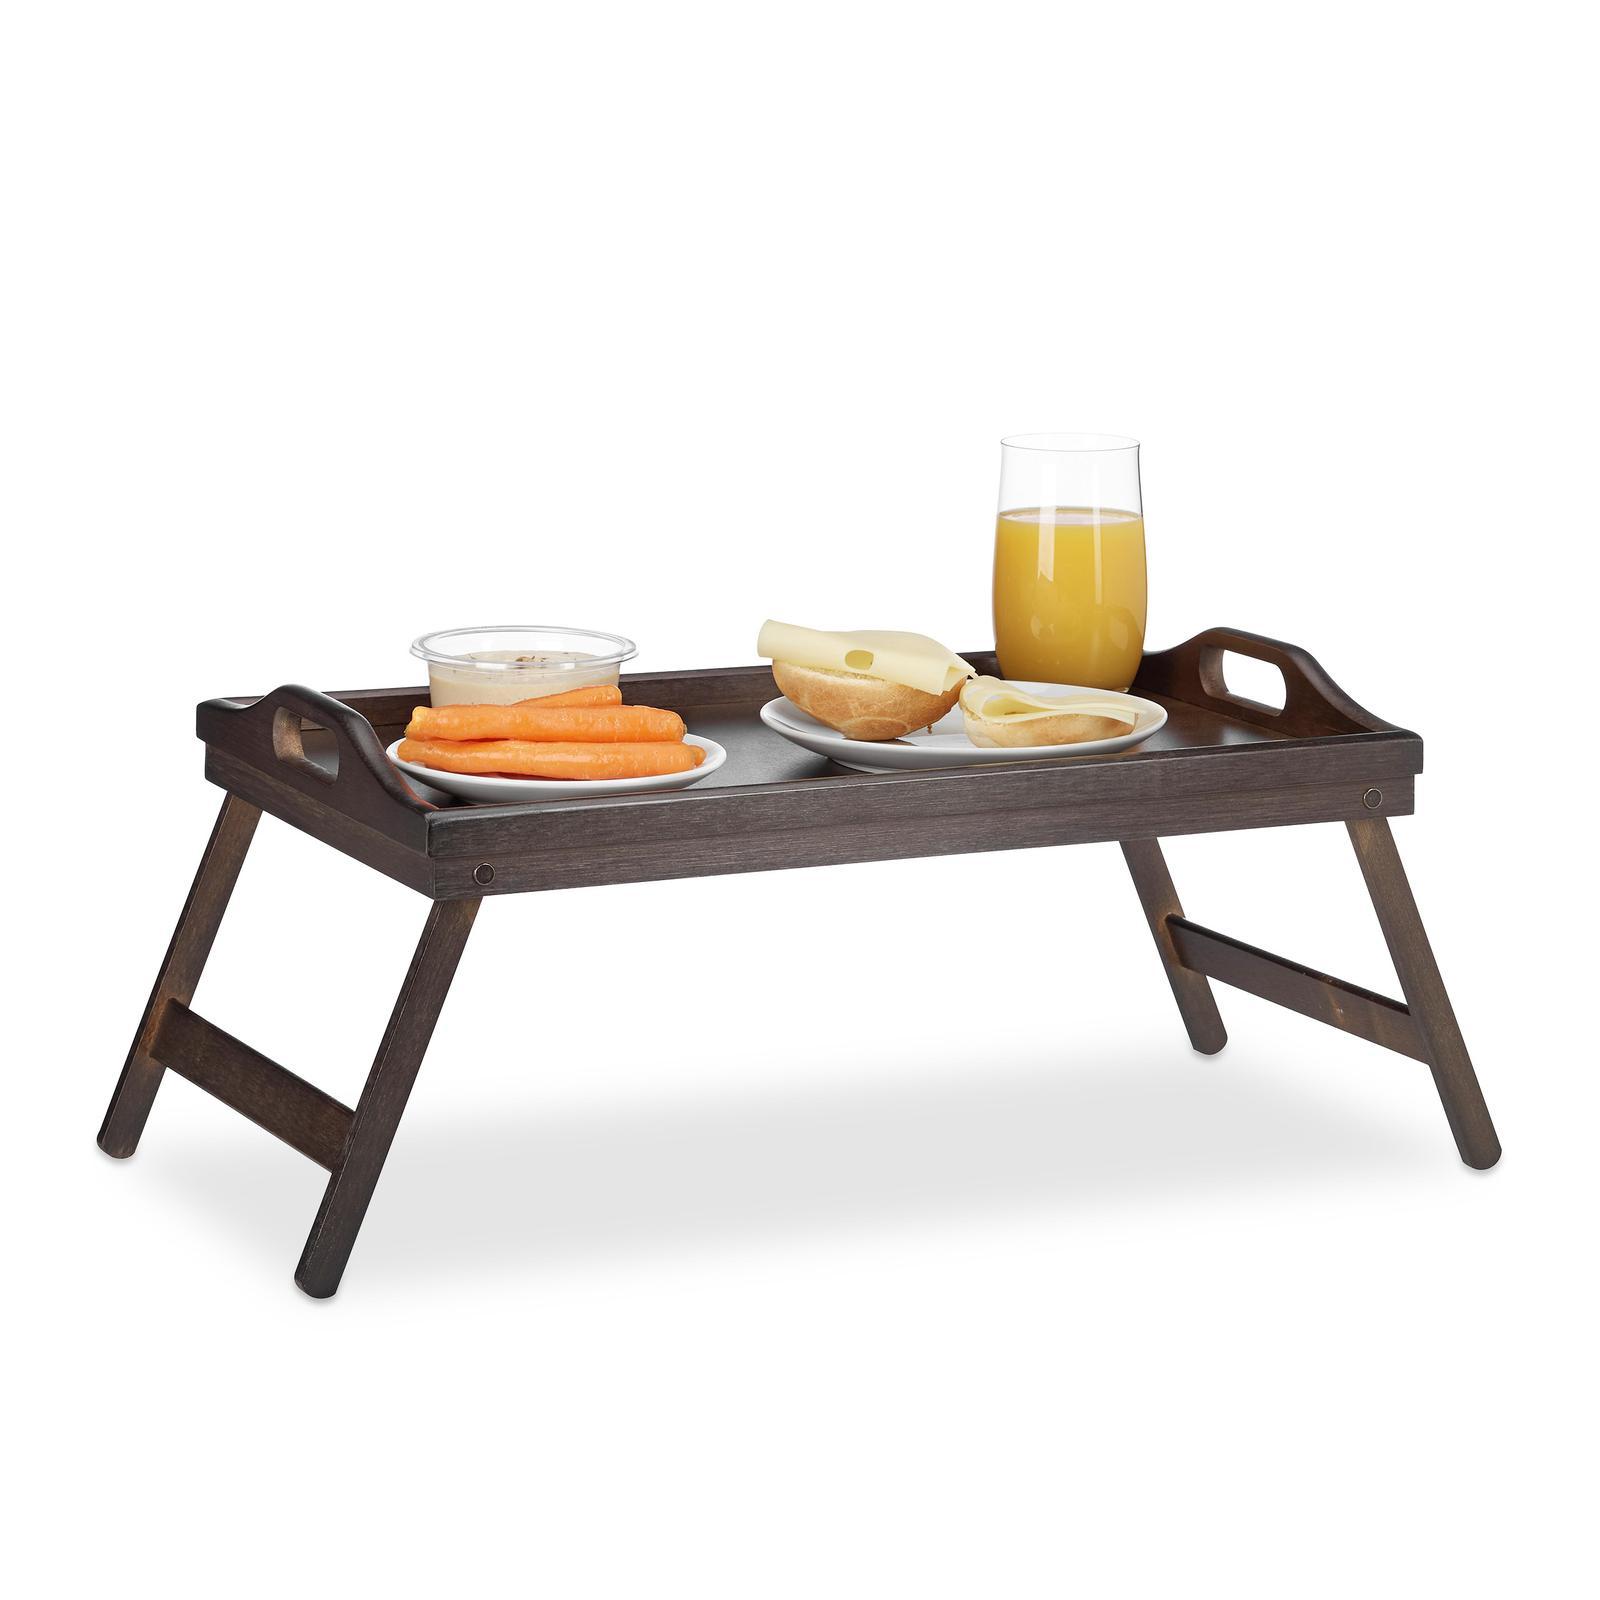 Stolík pre notebook, raňajkové stolíky - Obrázok č. 14